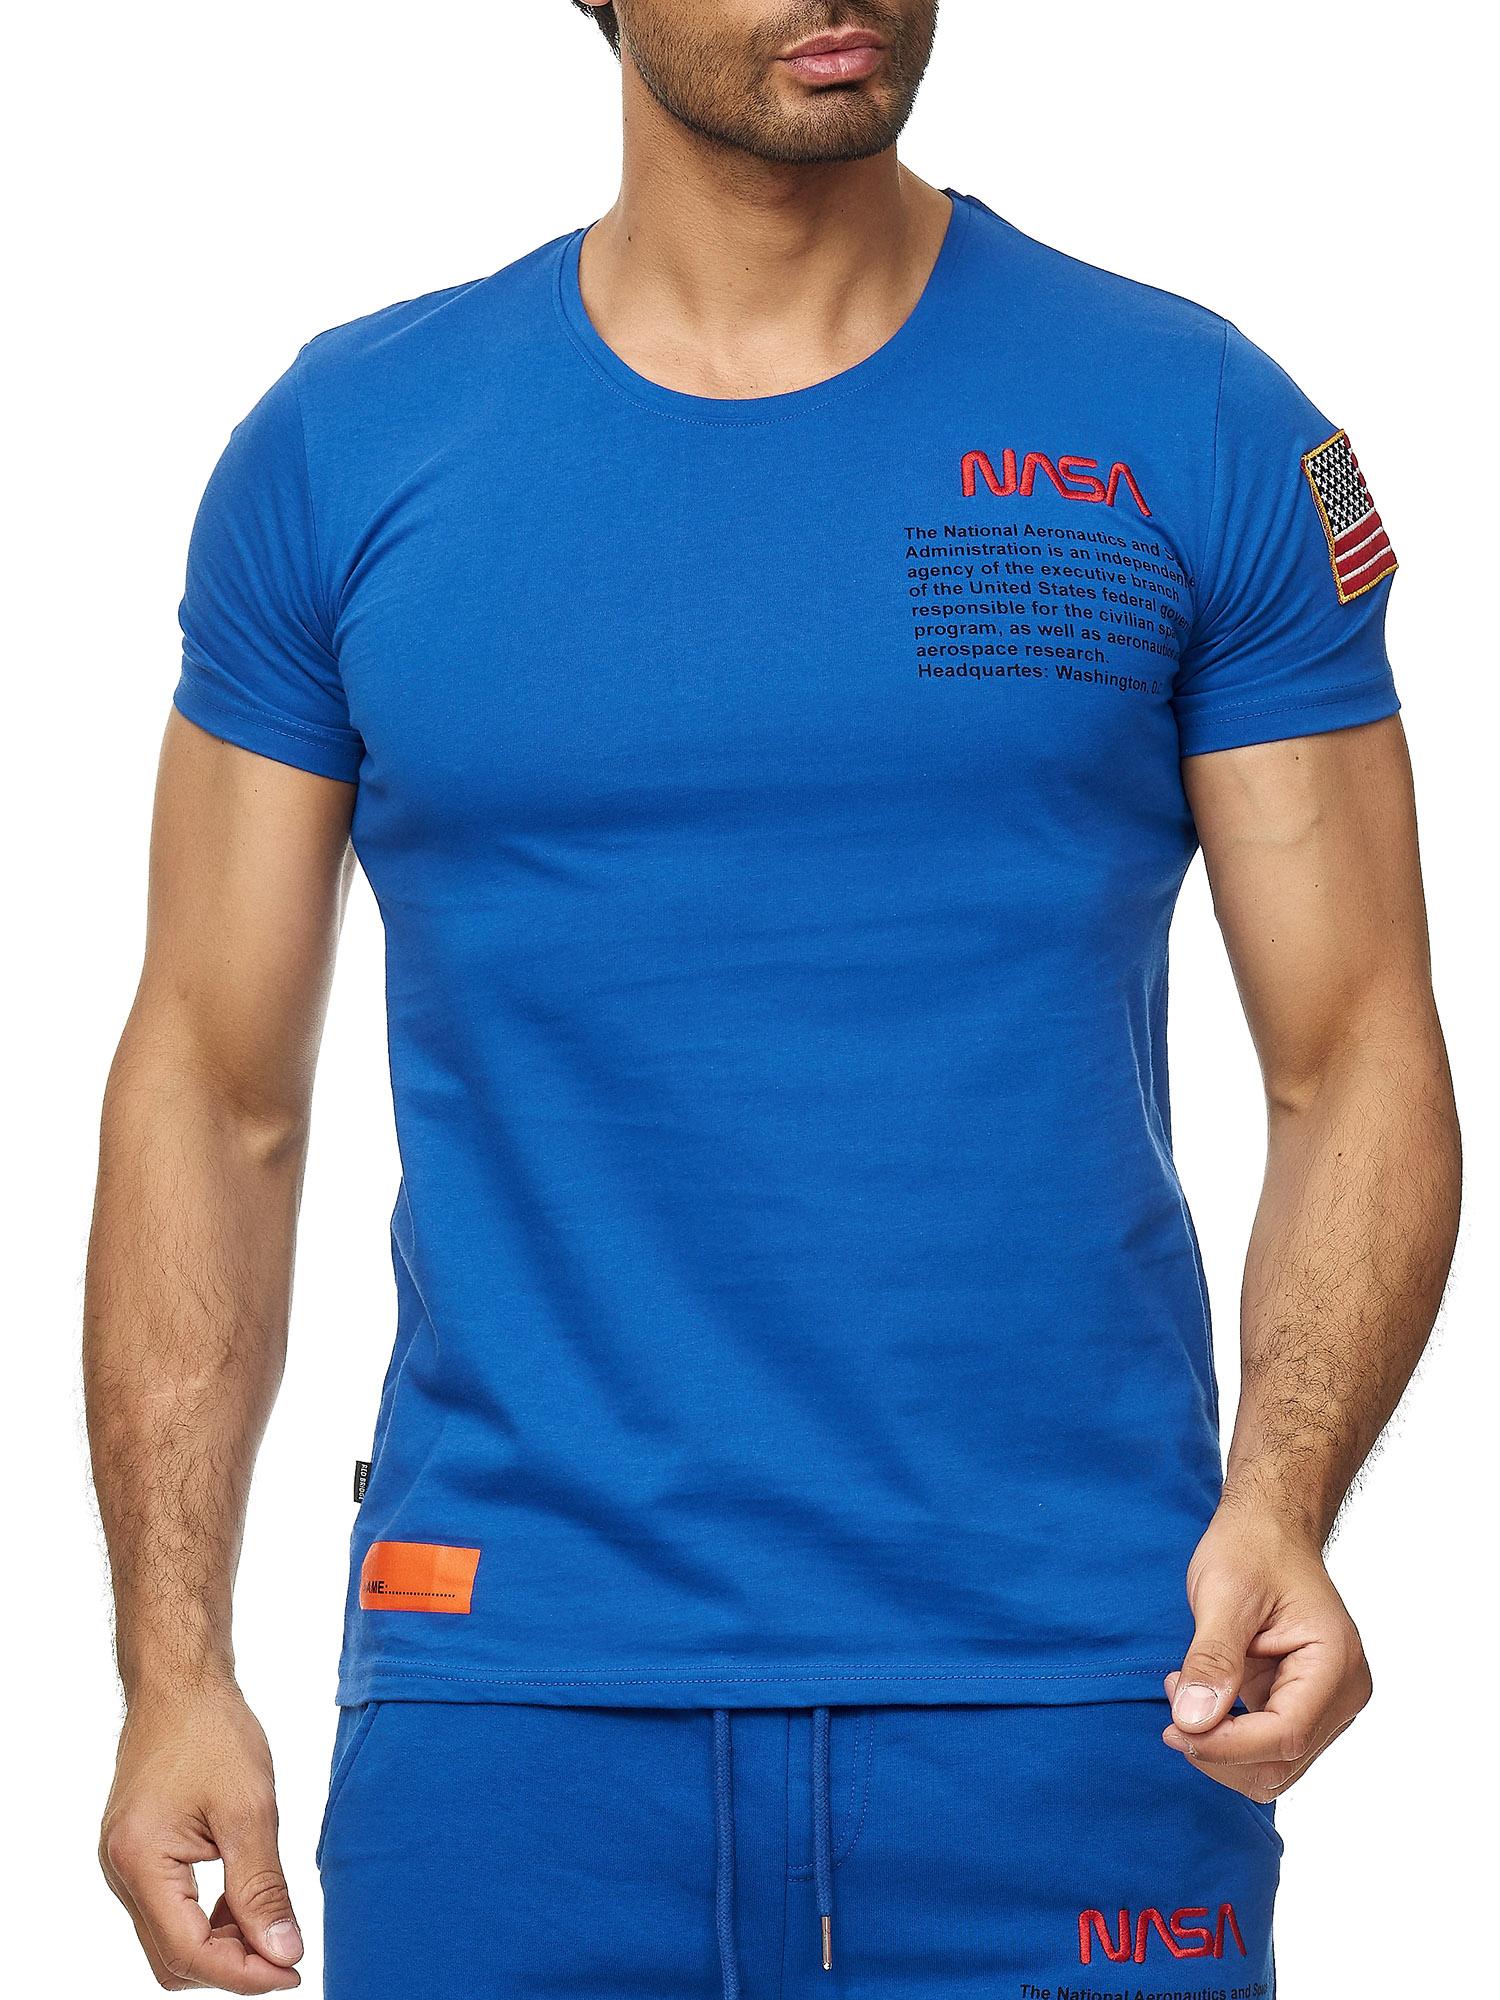 Redbridge Men/'s Nasa Hoody Sweater Jumper Space Shuttle T-Shirt